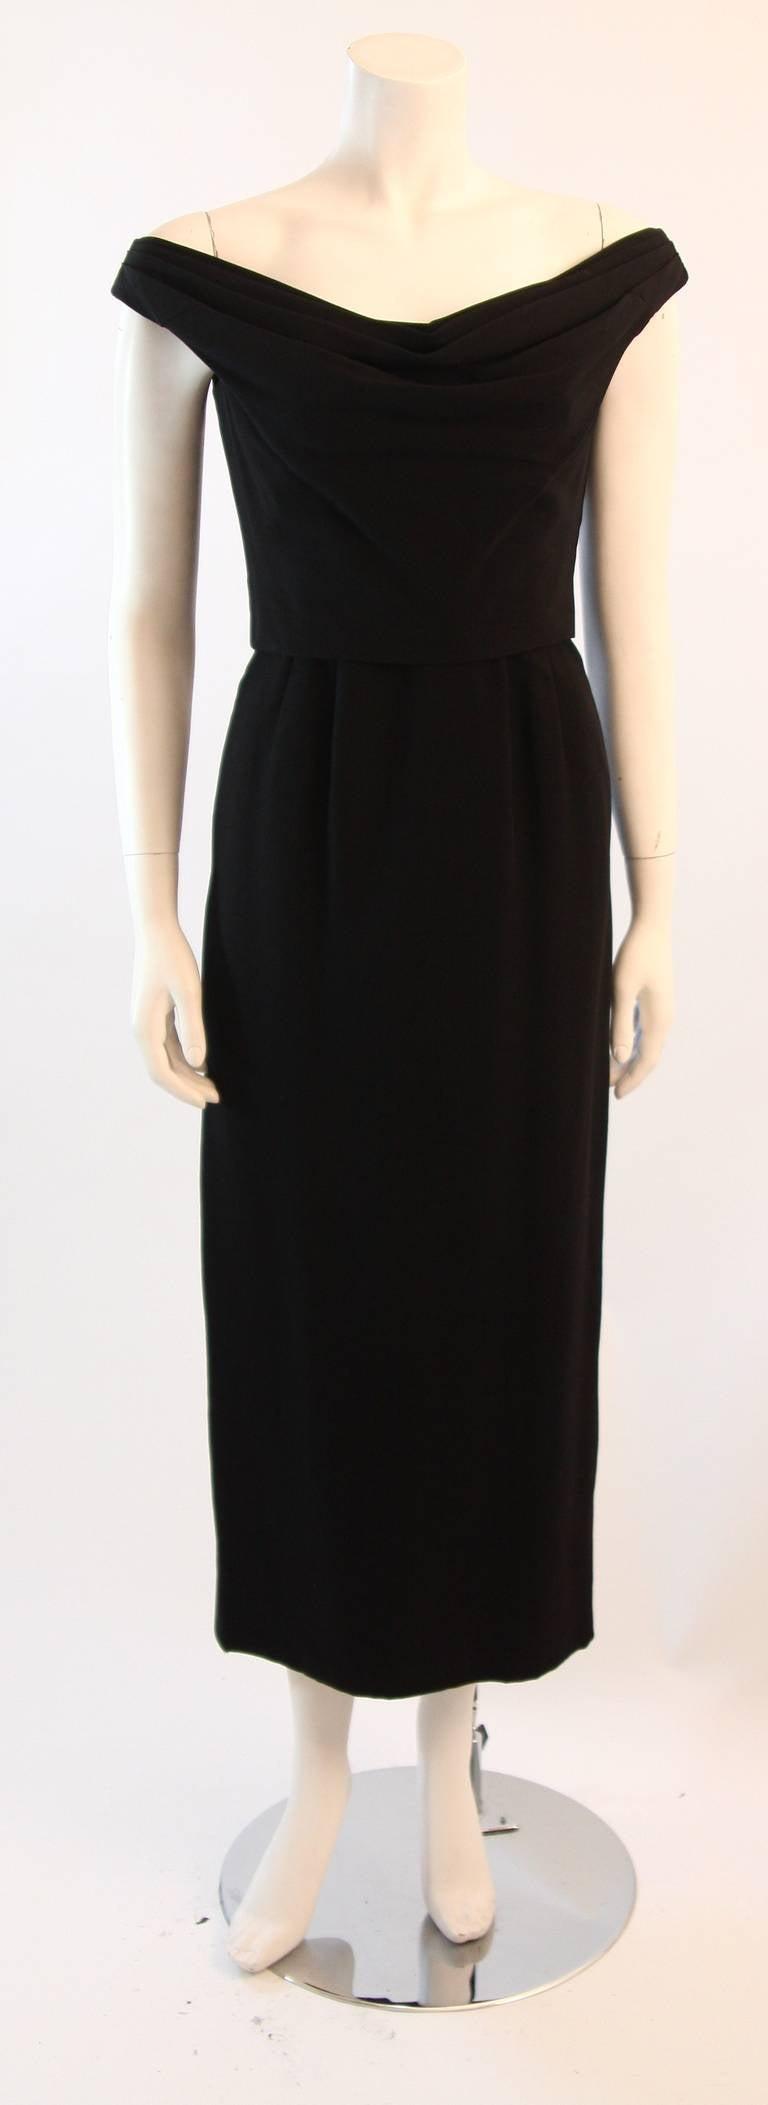 Dorothy O'Hara Black Silk Crepe Gown with Drape front split back design 2